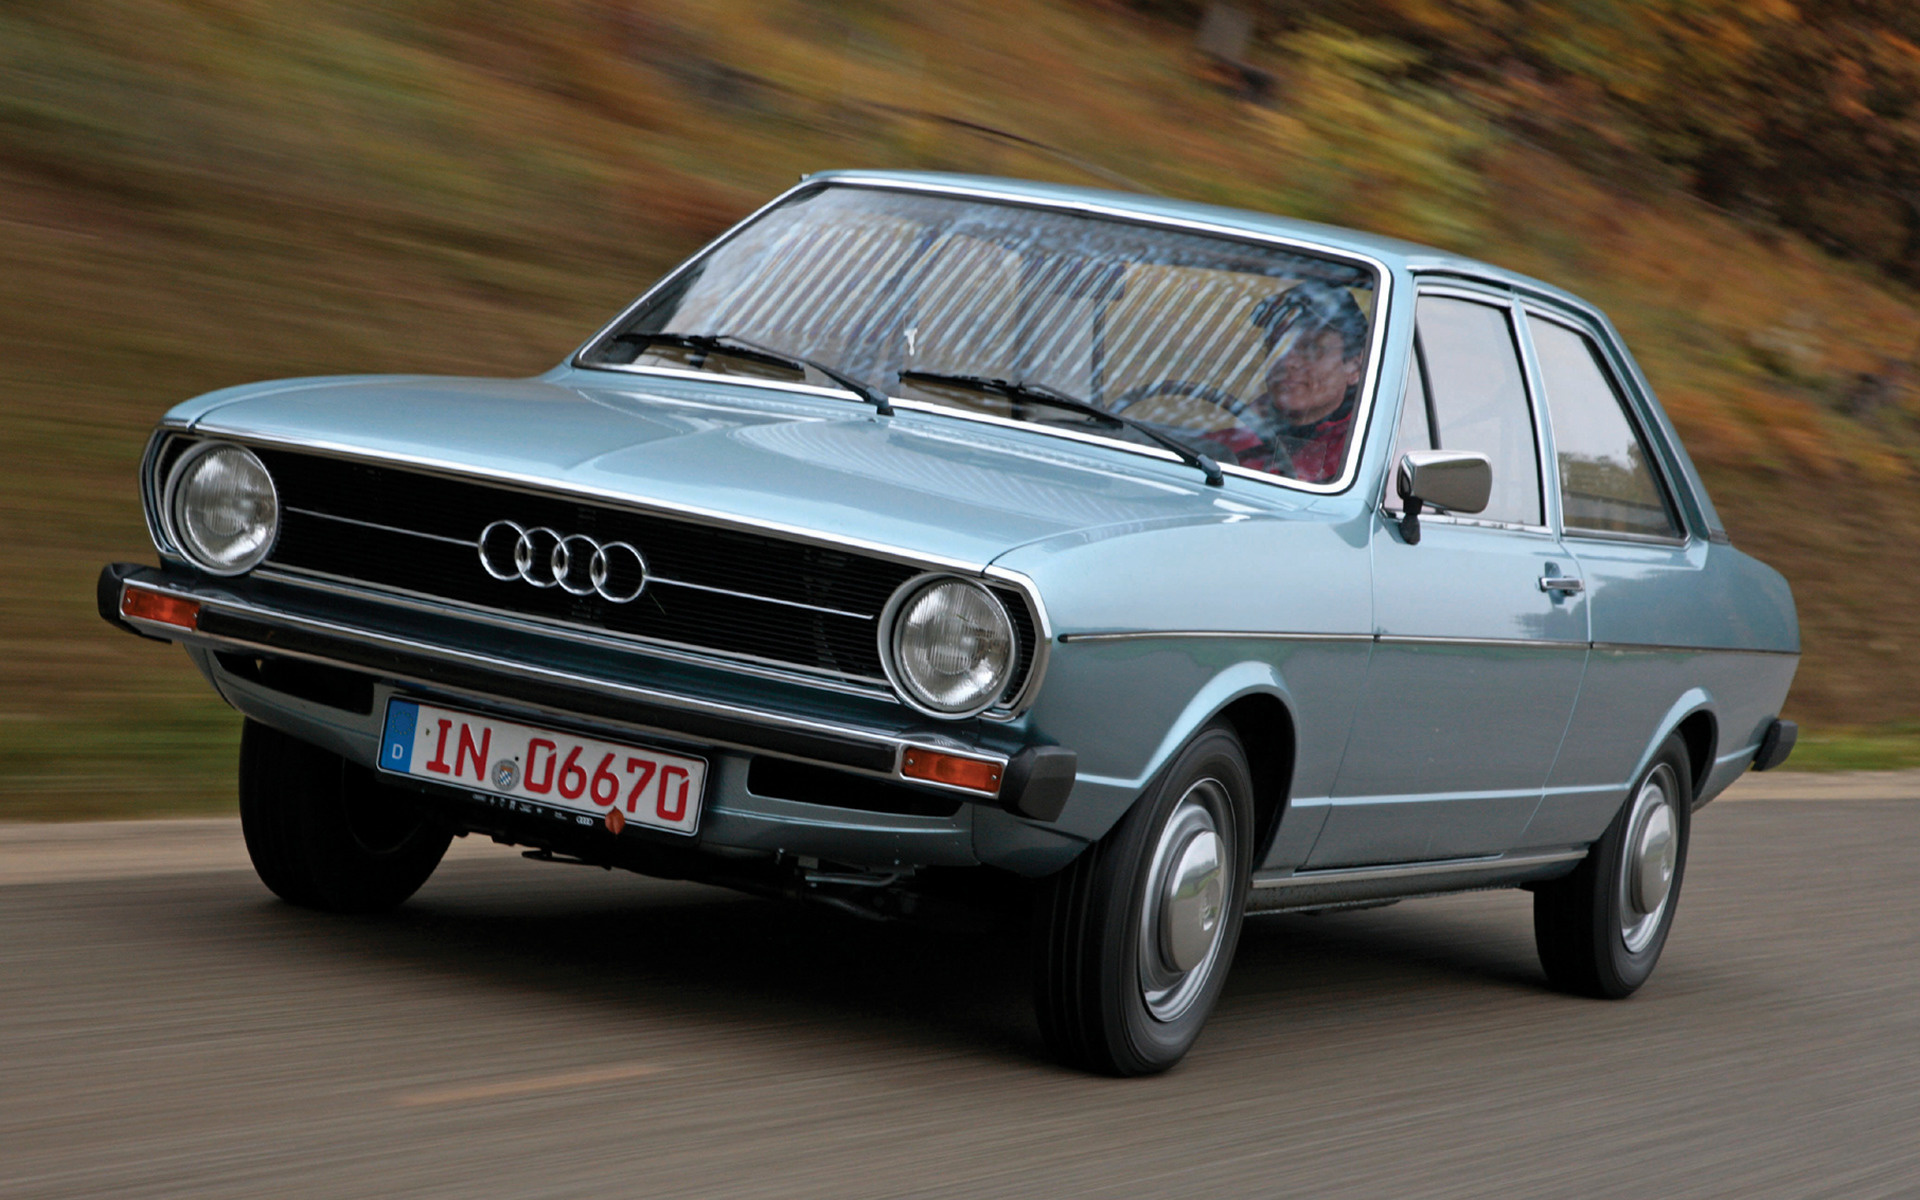 1972 Audi 80 2-door - Wallpapers and HD Images | Car Pixel